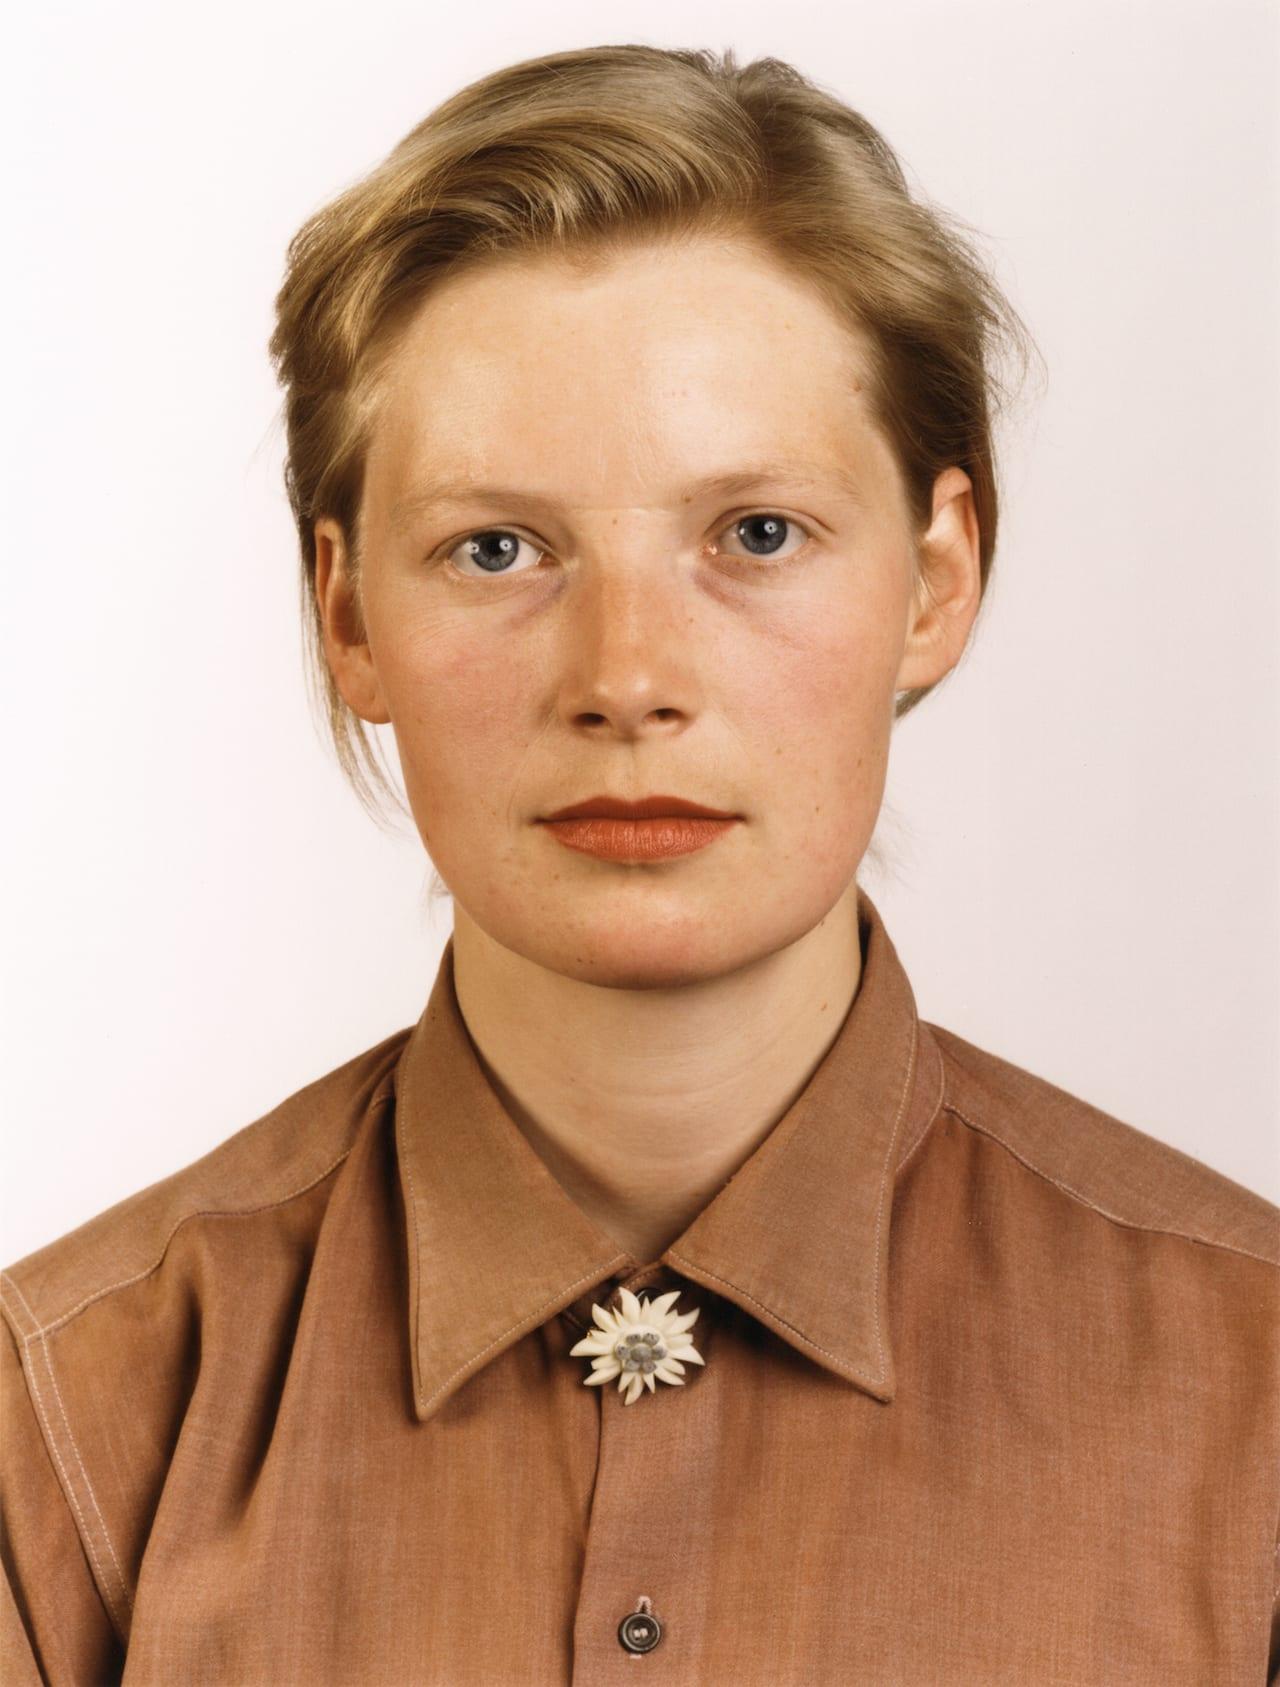 Thomas Ruff Portraits